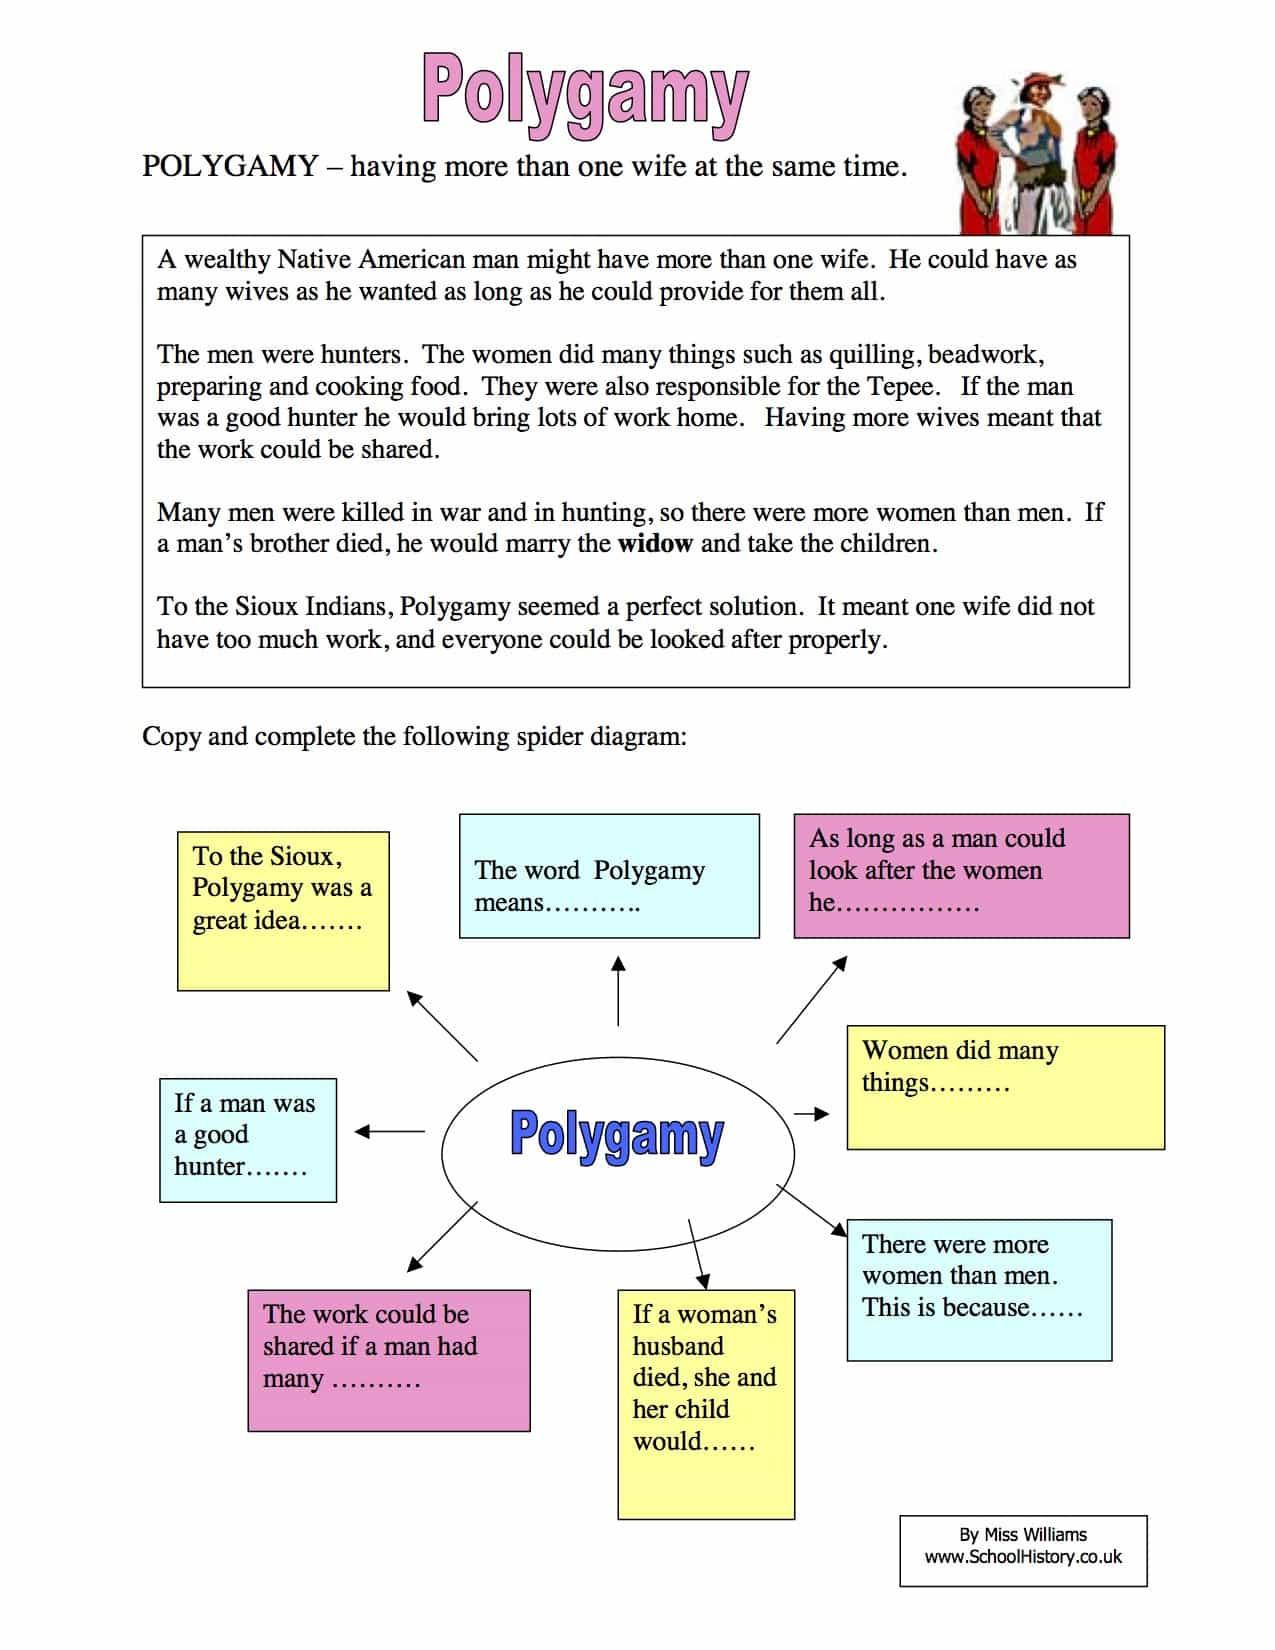 Spidergram Worksheet Elizabeth